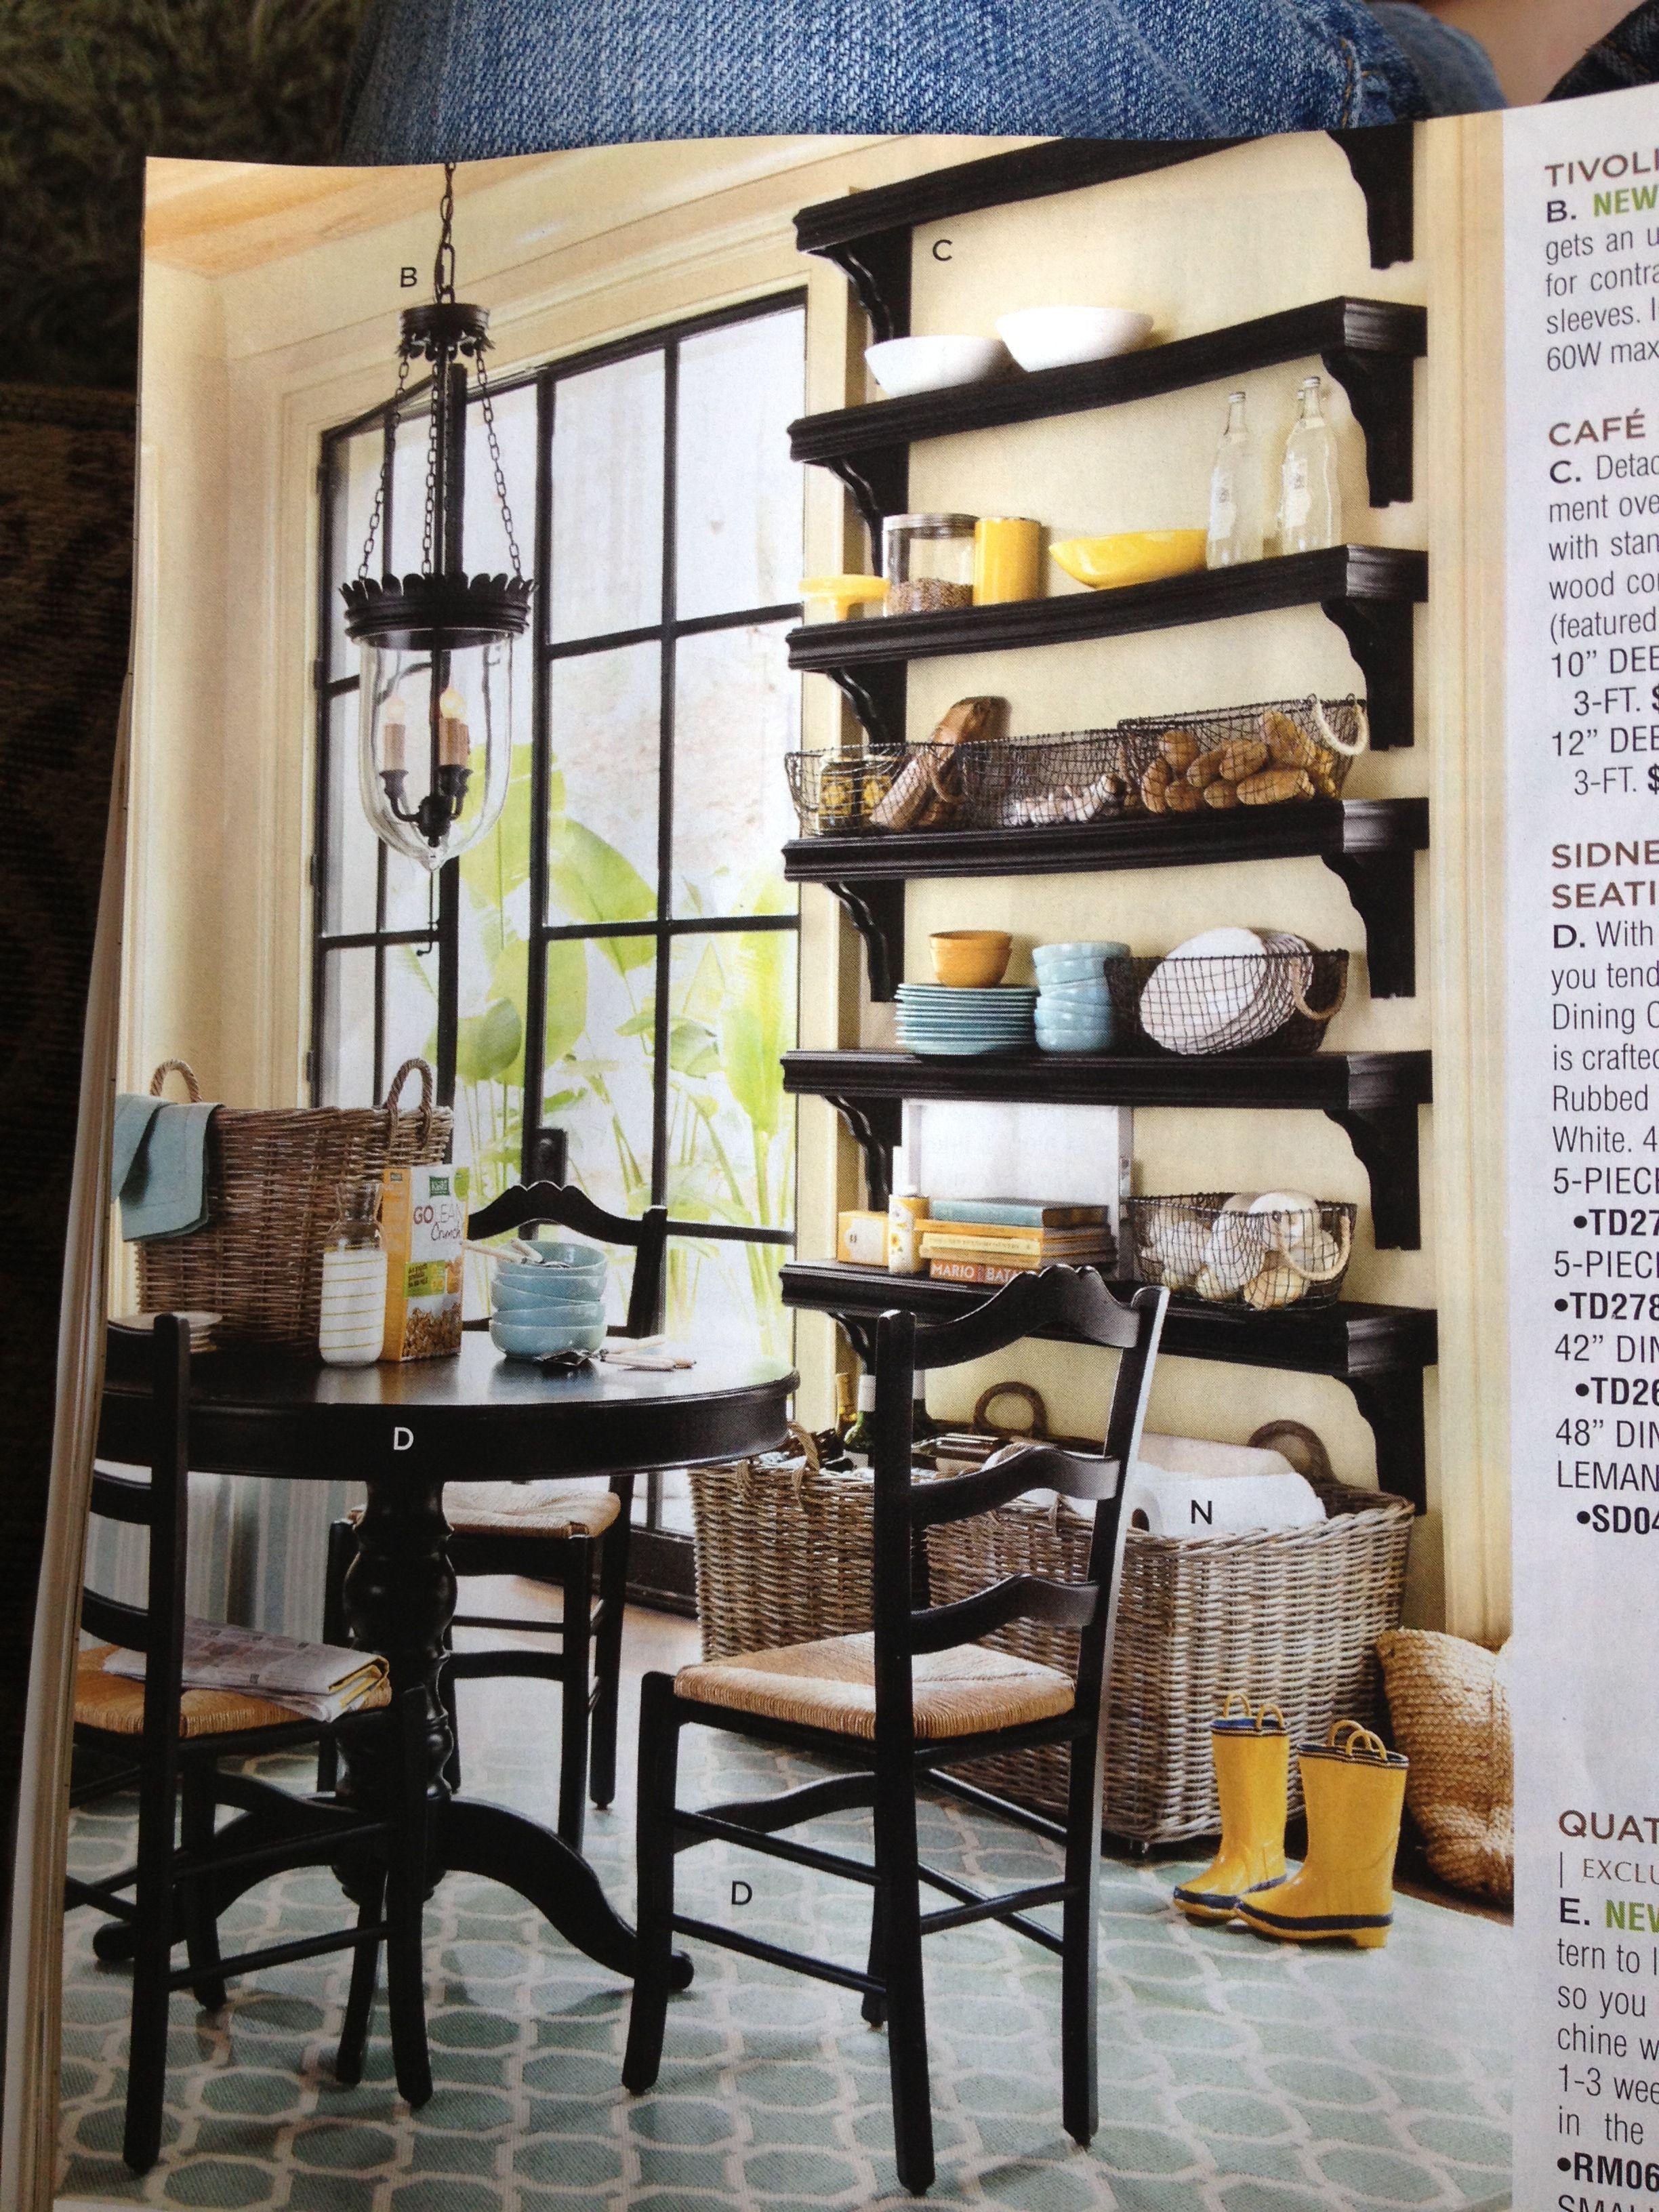 Love the shelves! | Home, Dining room shelves, Dining room ...